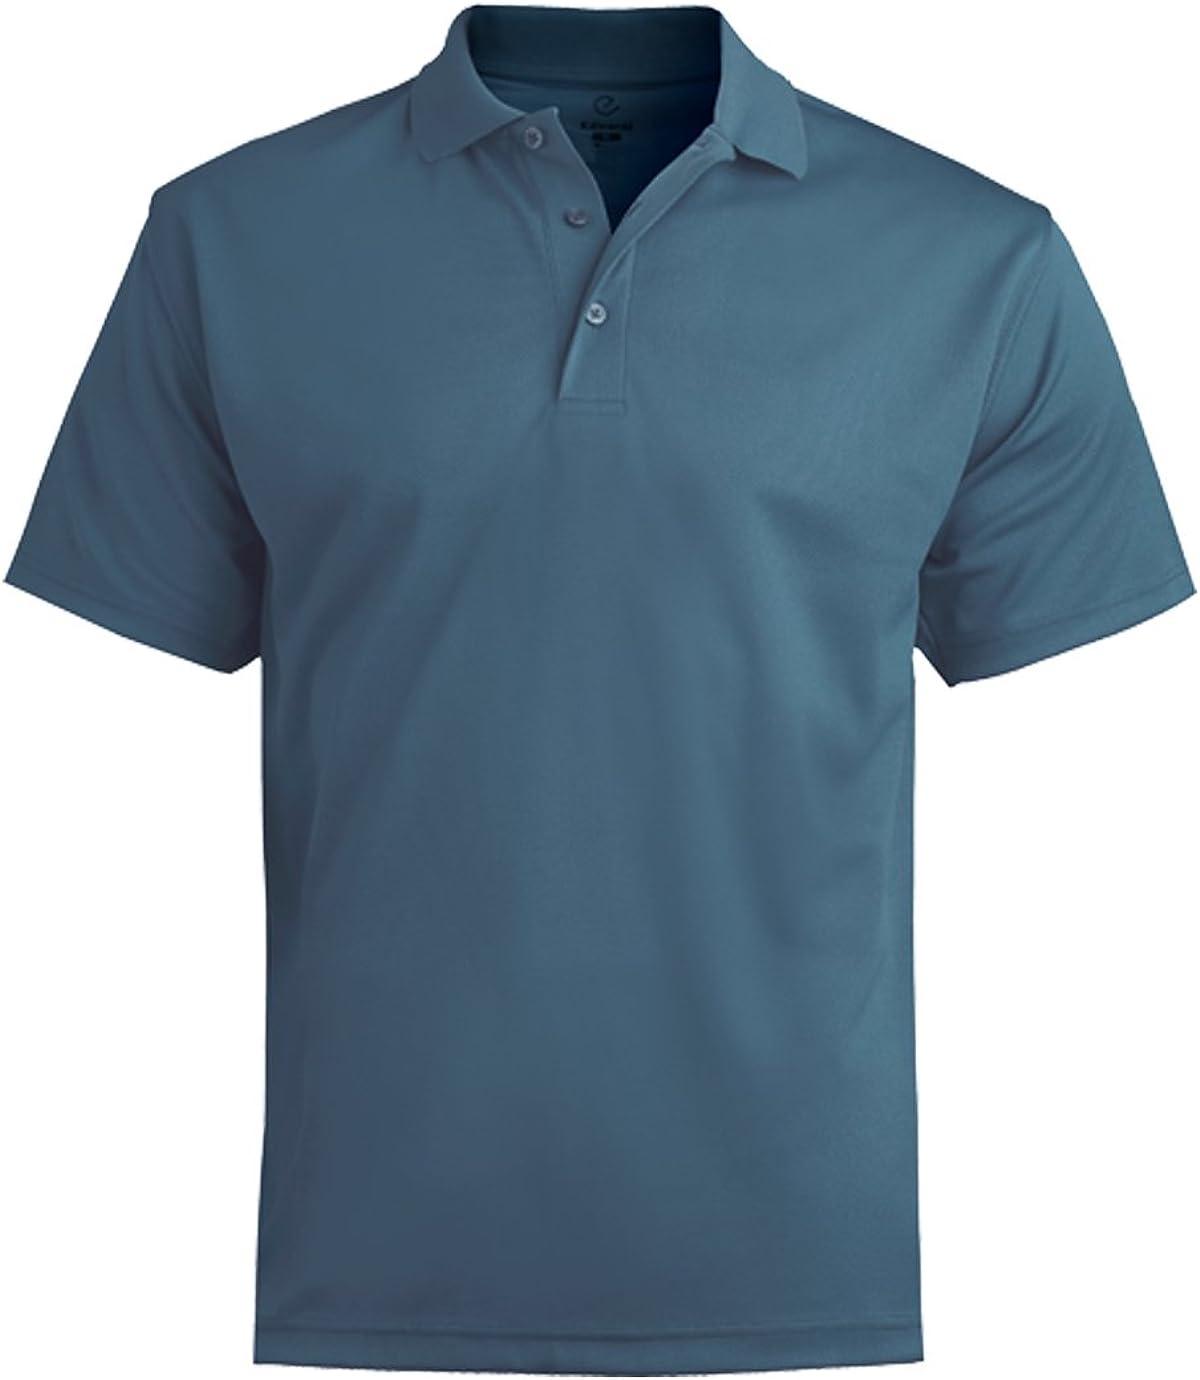 Edwards Garment Men's Big And Tall Hi-Performance Polo Shirt_SLATE BLUE_5XLT